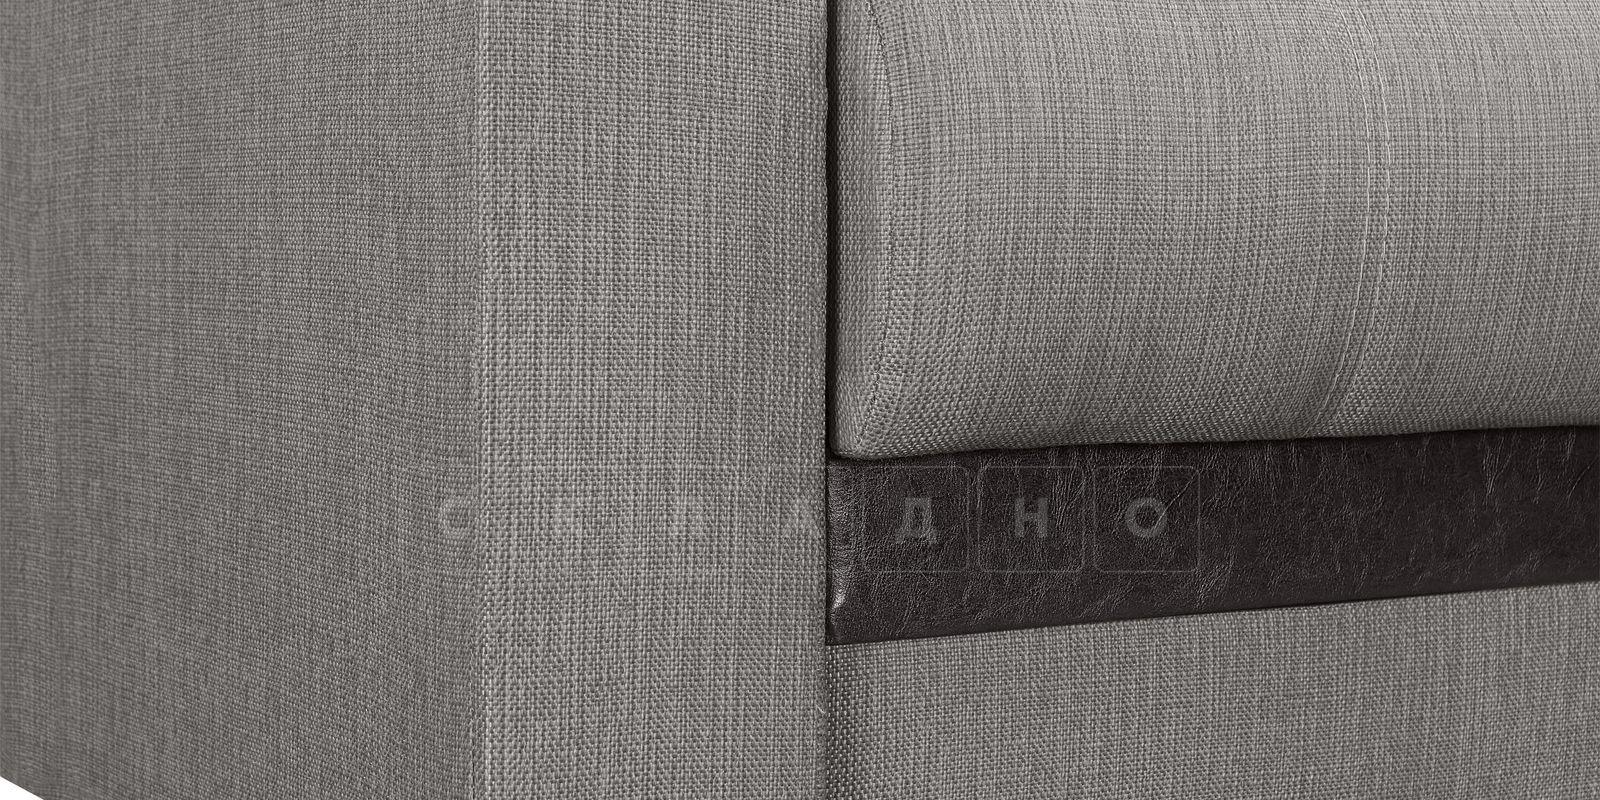 Диван Атланта рогожка серого цвета фото 7 | интернет-магазин Складно